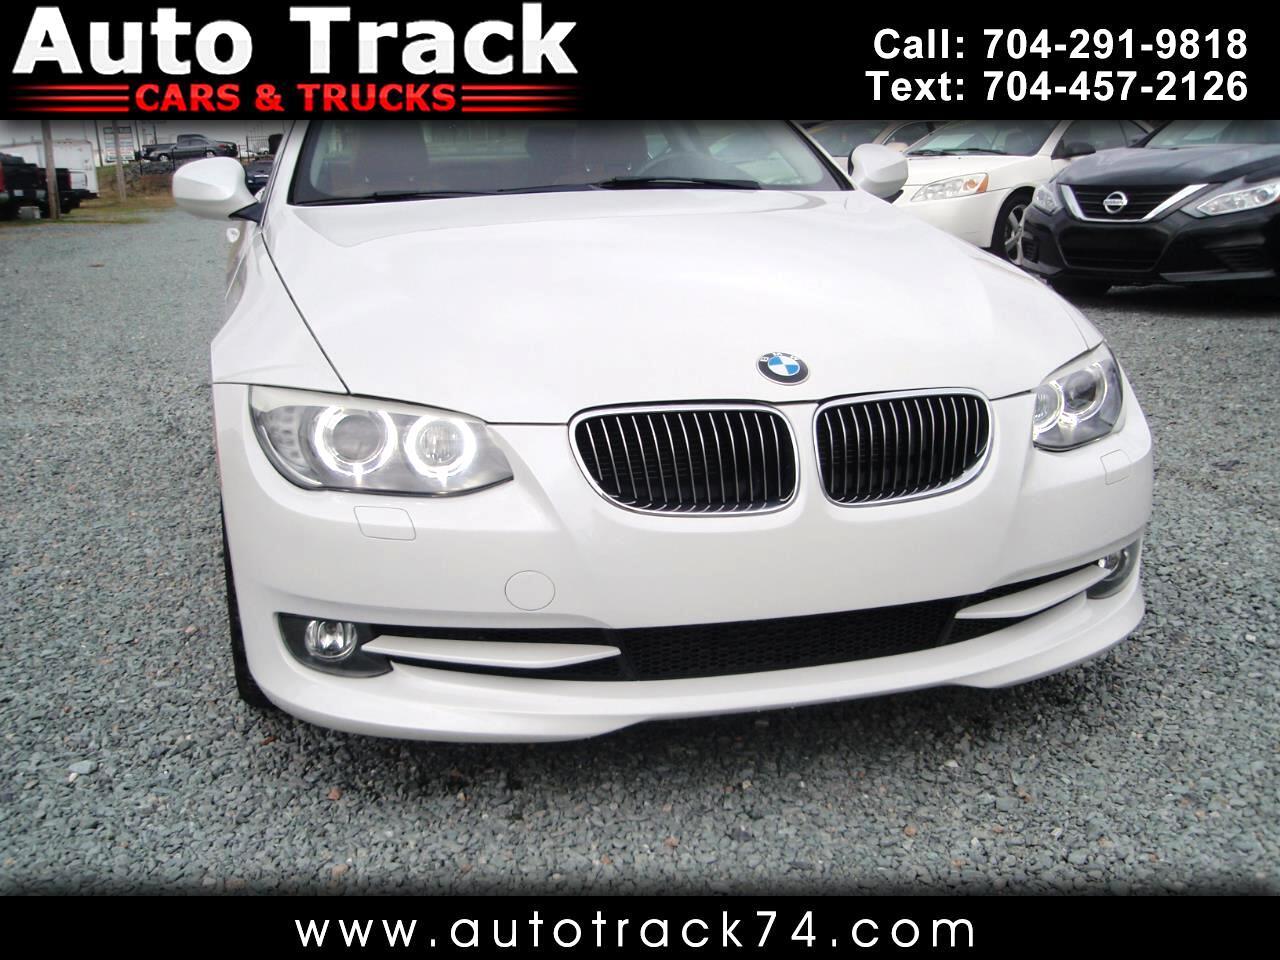 BMW 3 Series 2dr Cpe 335i RWD 2013